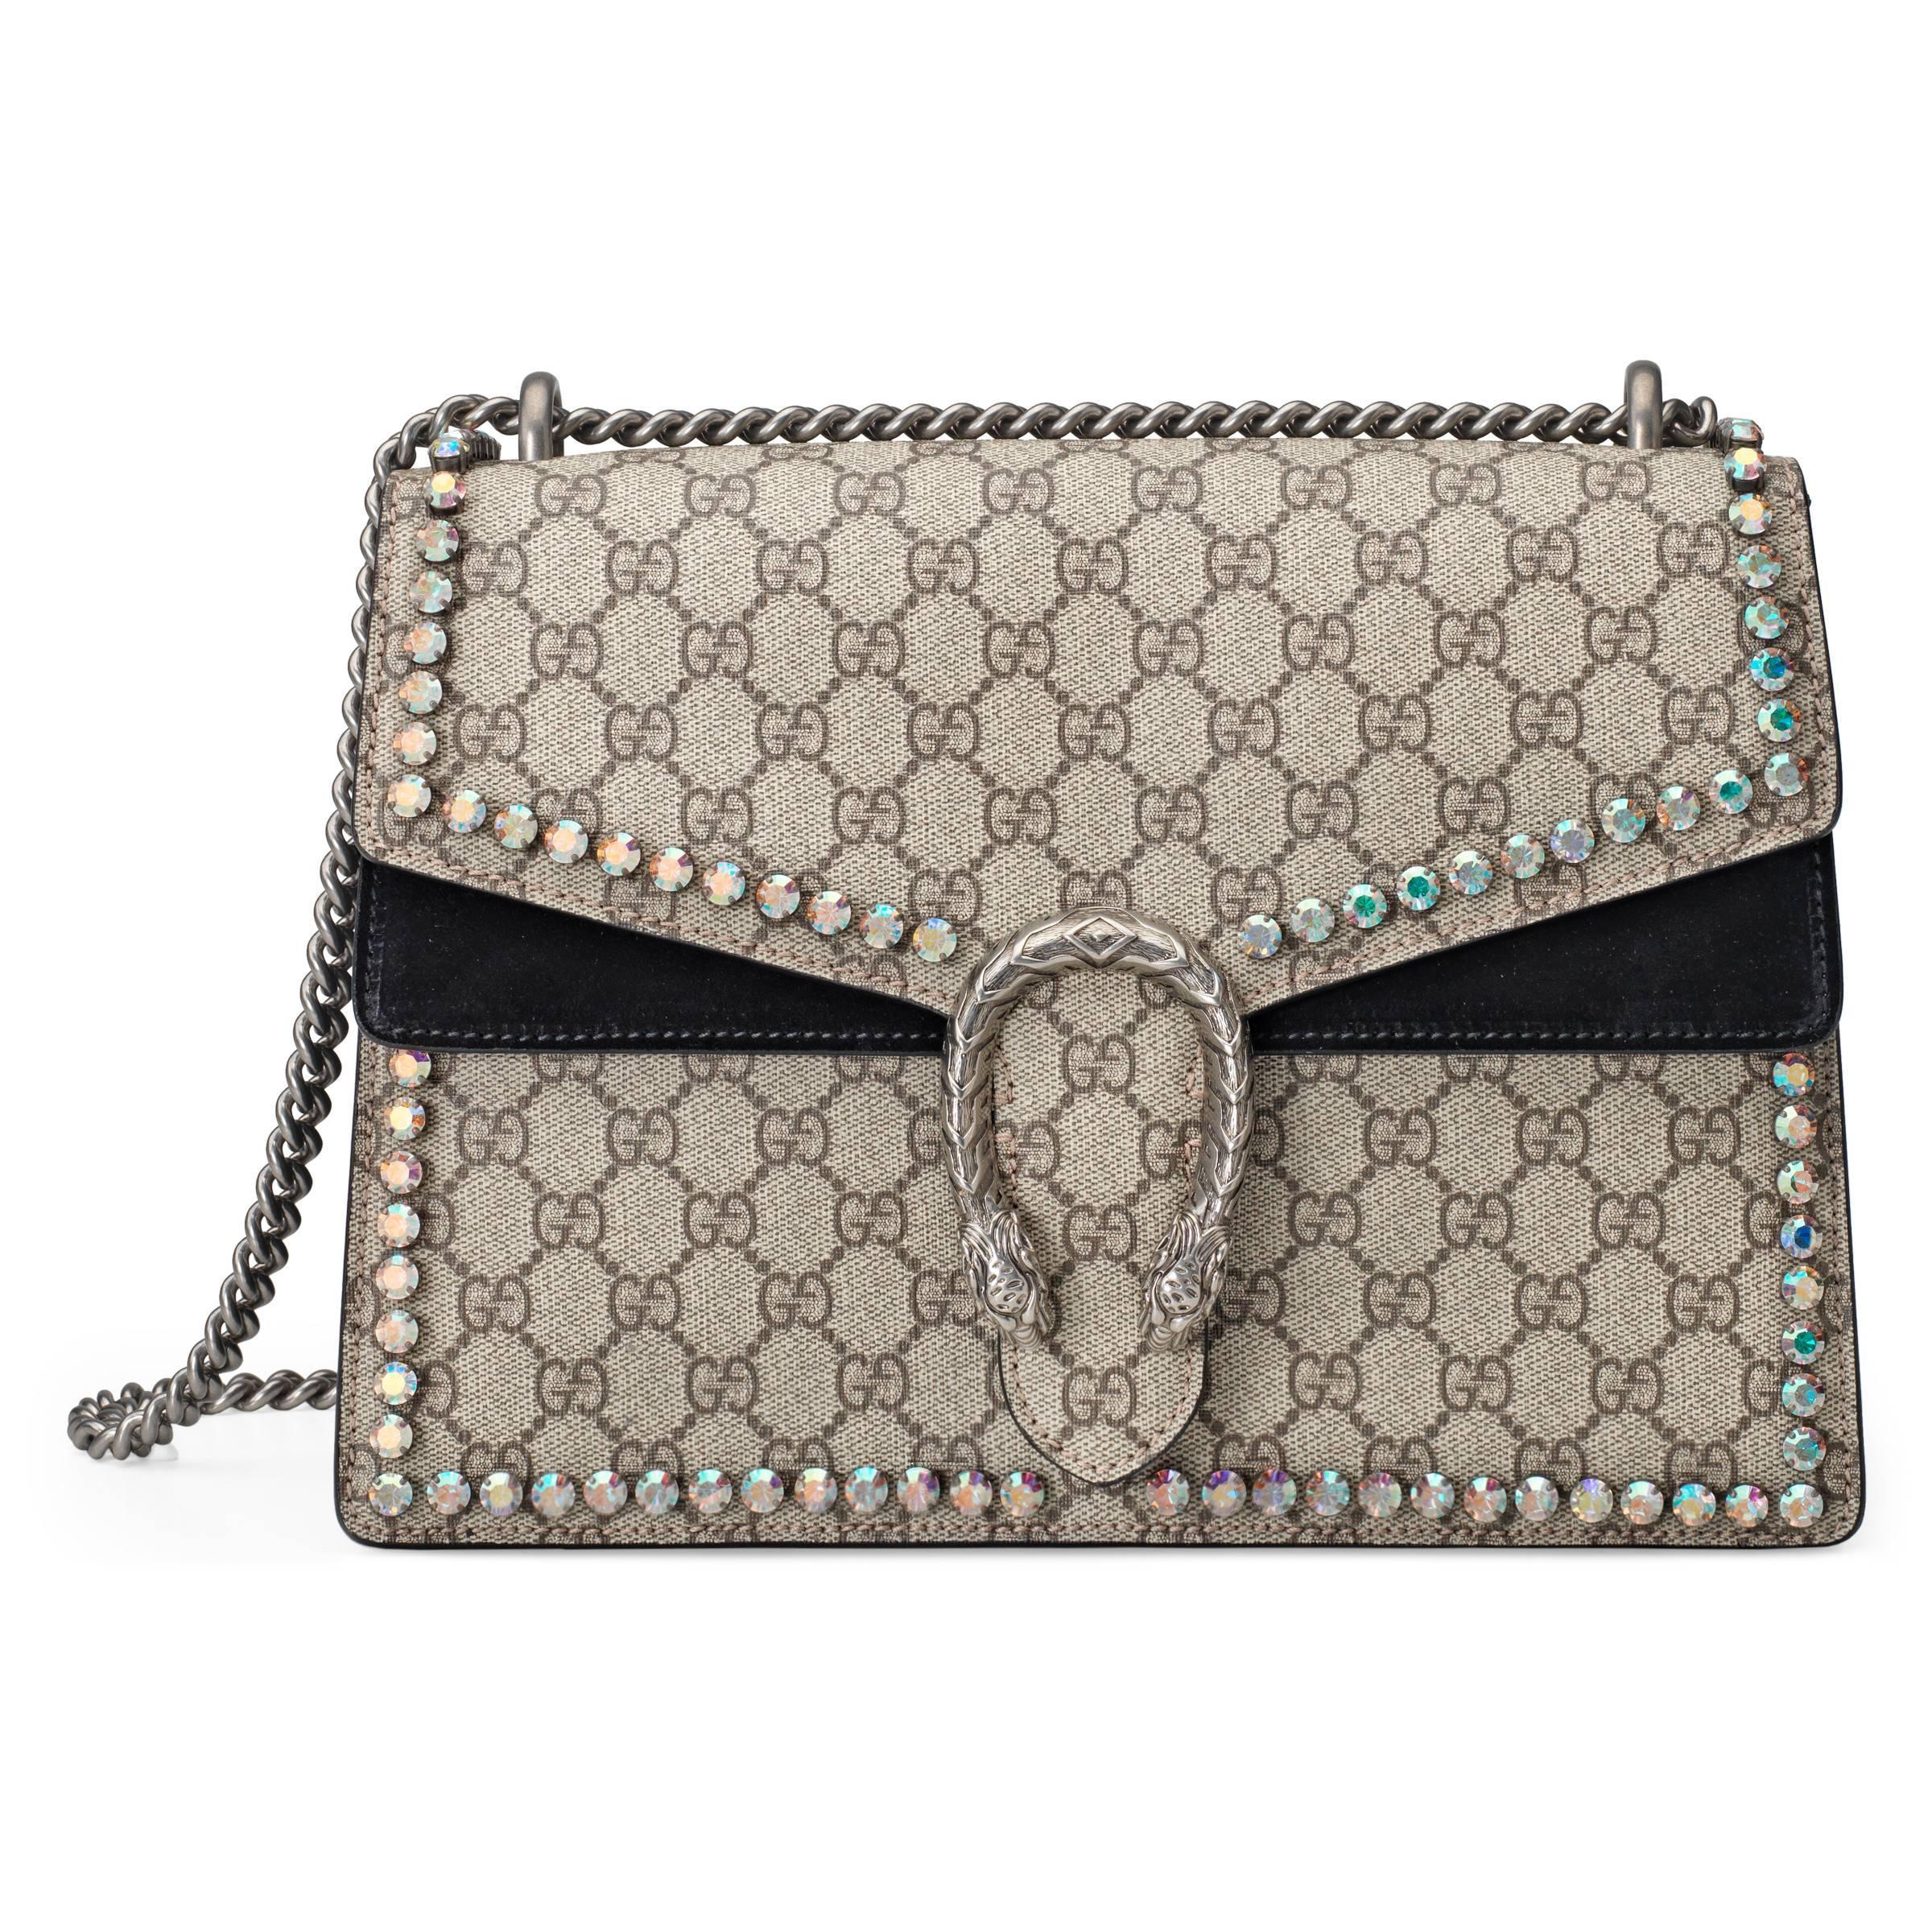 efb49174863 Gucci Dionysus GG Supreme Shoulder Bag With Crystals in Natural - Lyst